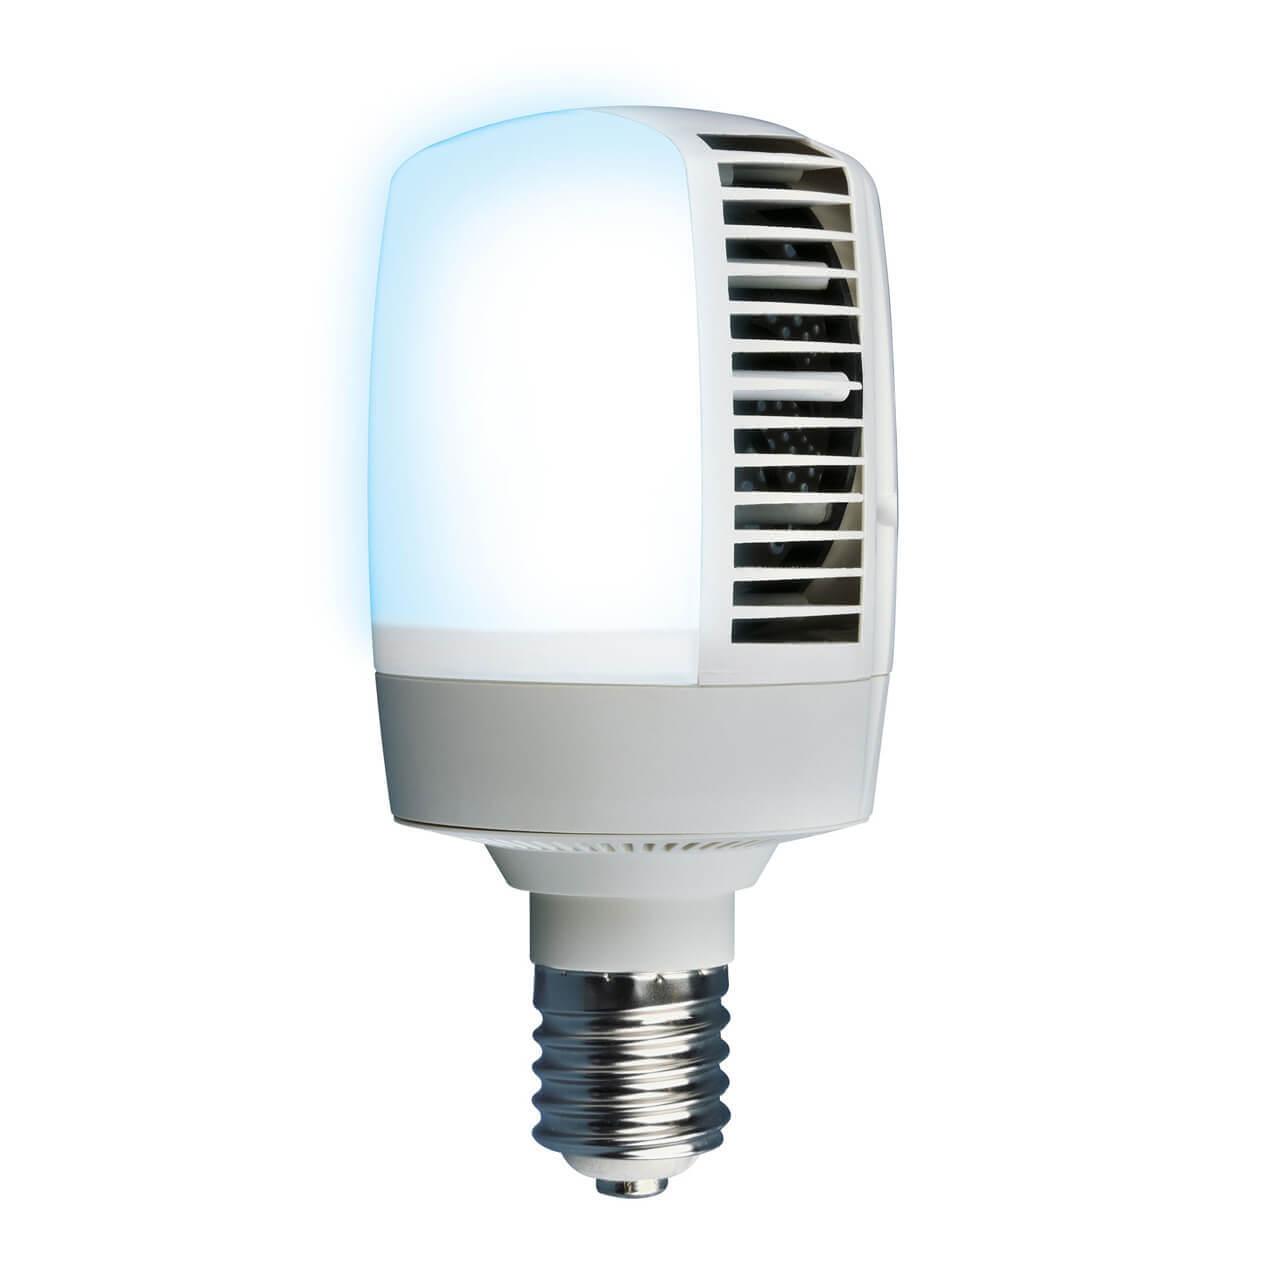 Лампочка Uniel LED-M105-70W/DW/E40/FR ALV02WH Venturo M105